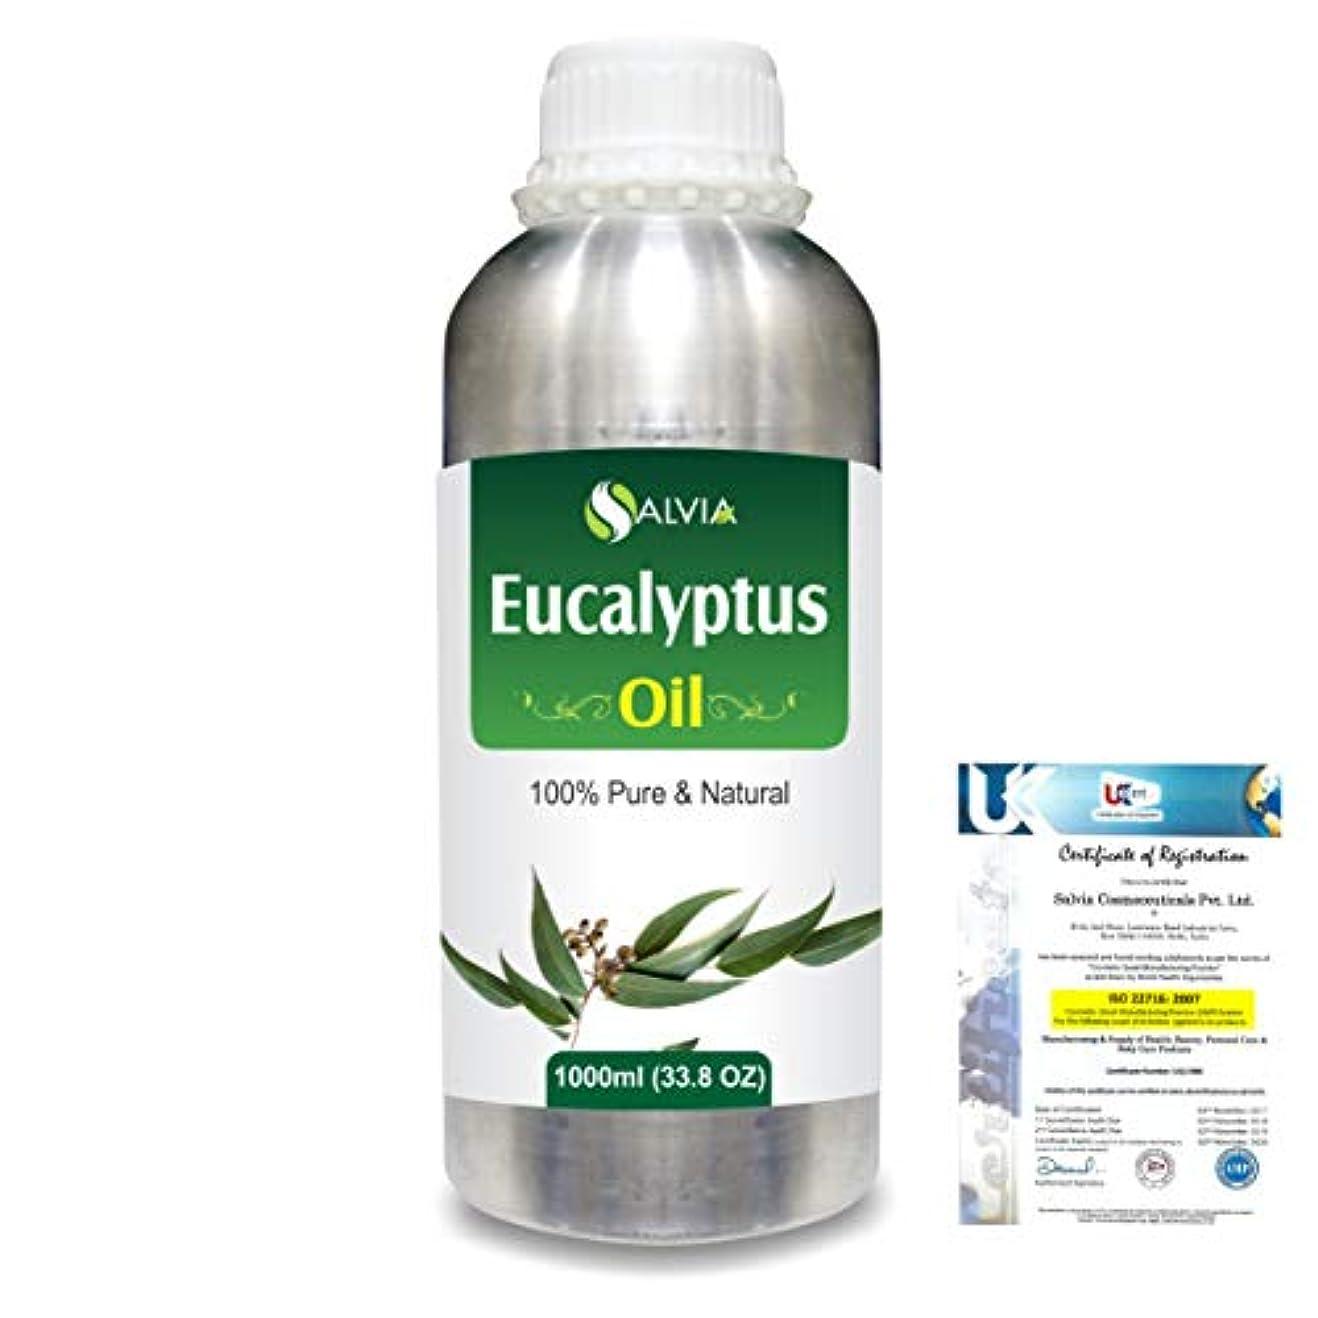 Eucalyptus (Eucalyptus Globulus) 100% Natural Pure Essential Oil 1000ml/33.8fl.oz.